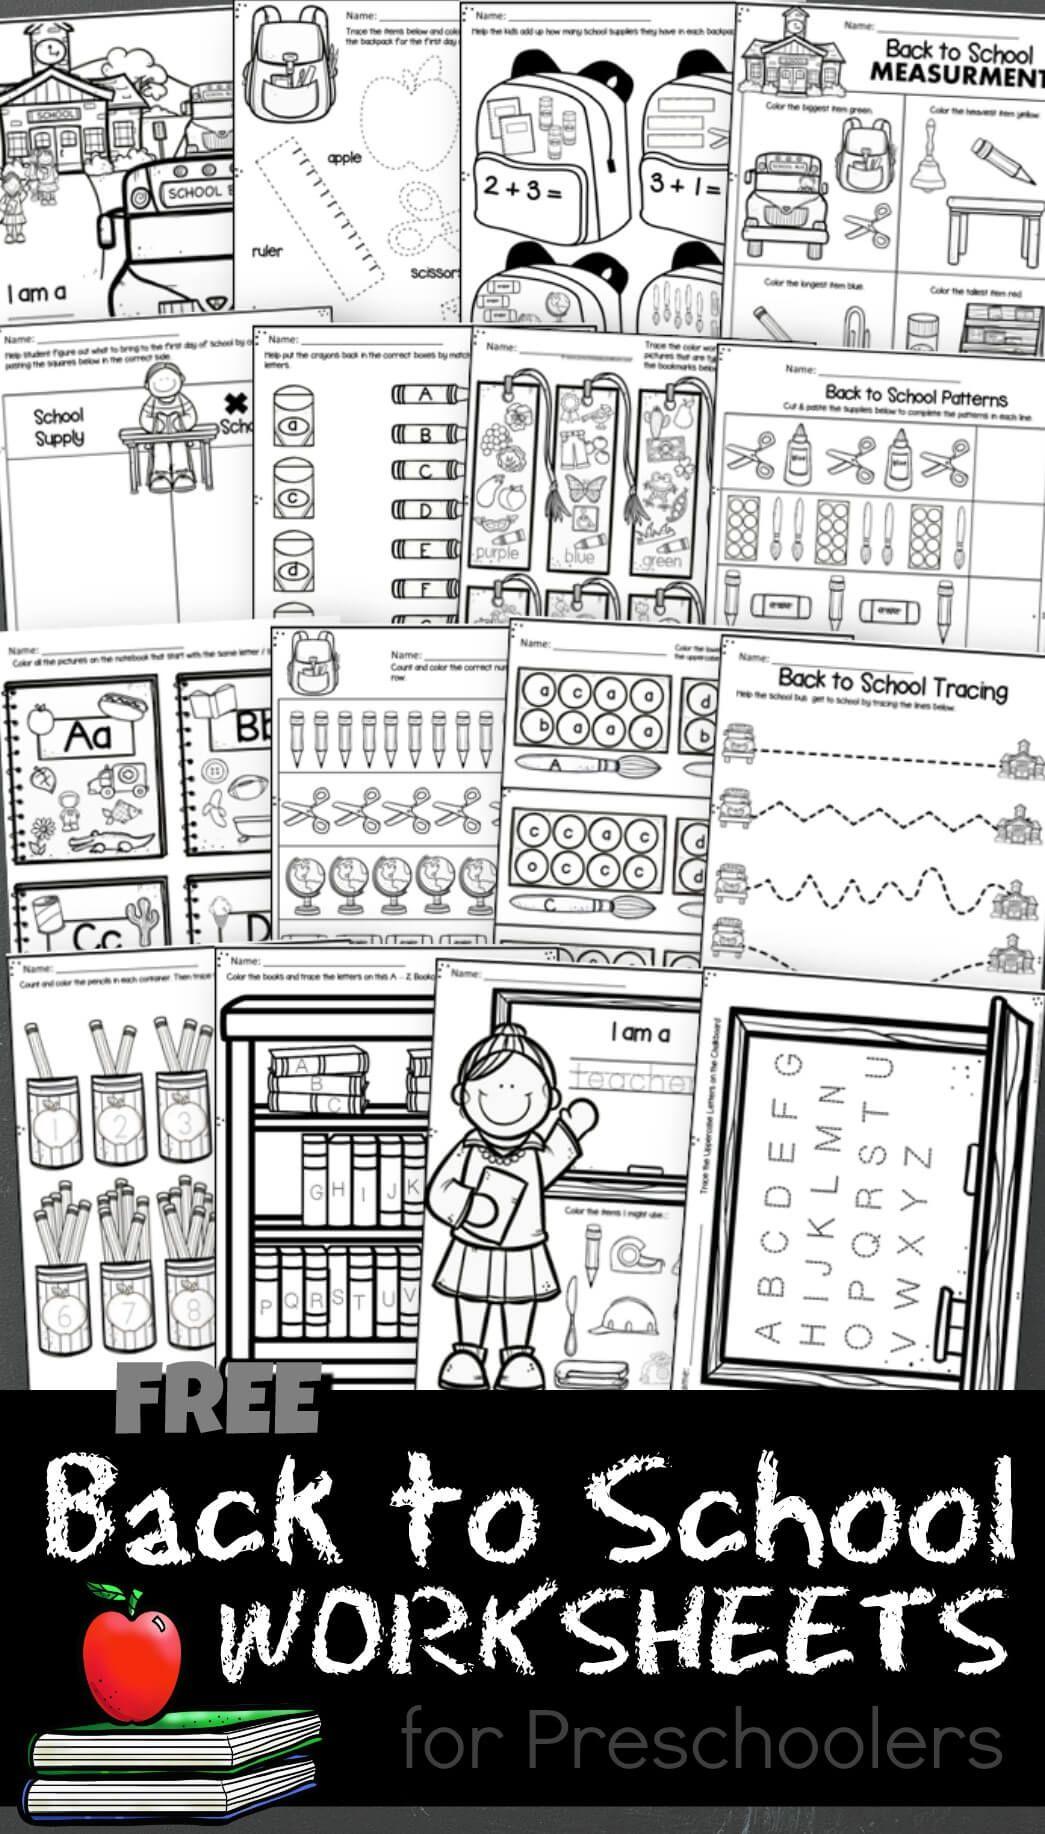 Free Back To School Worksheets For Preschoolers